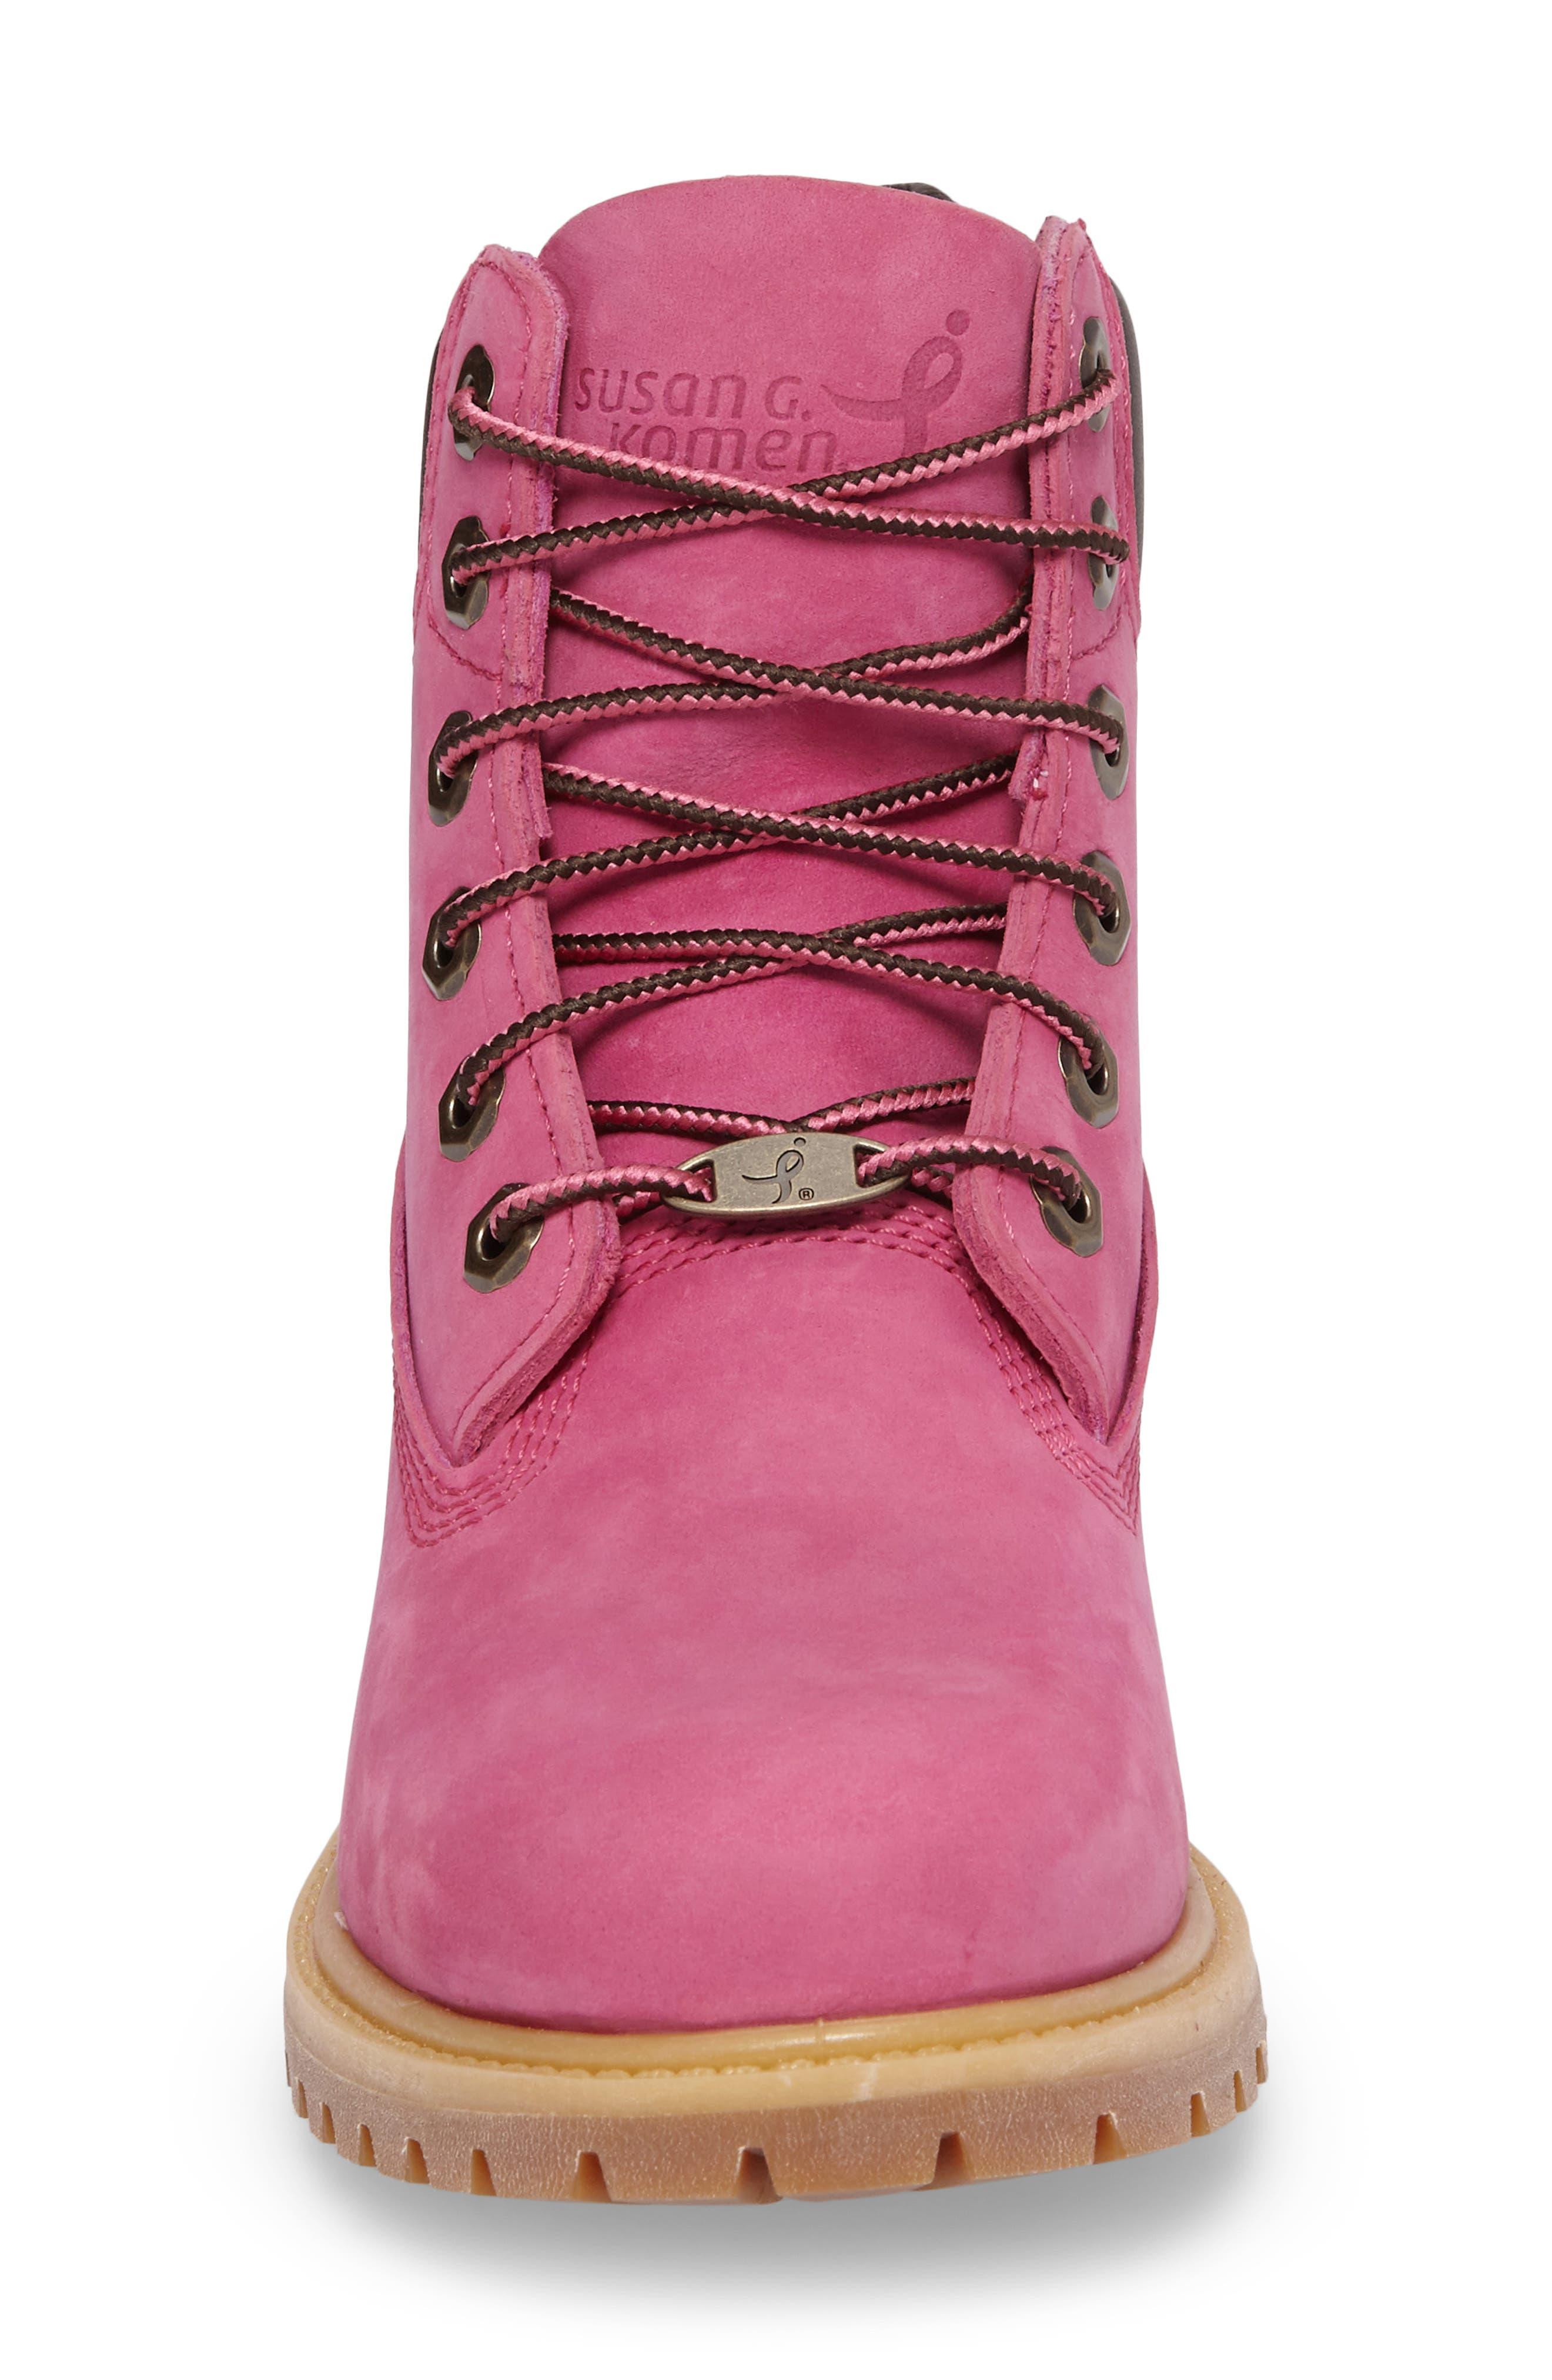 x Susan G. Komen 6-Inch Waterproof Insulated Boot,                             Alternate thumbnail 4, color,                             Bright Pink Nubuck